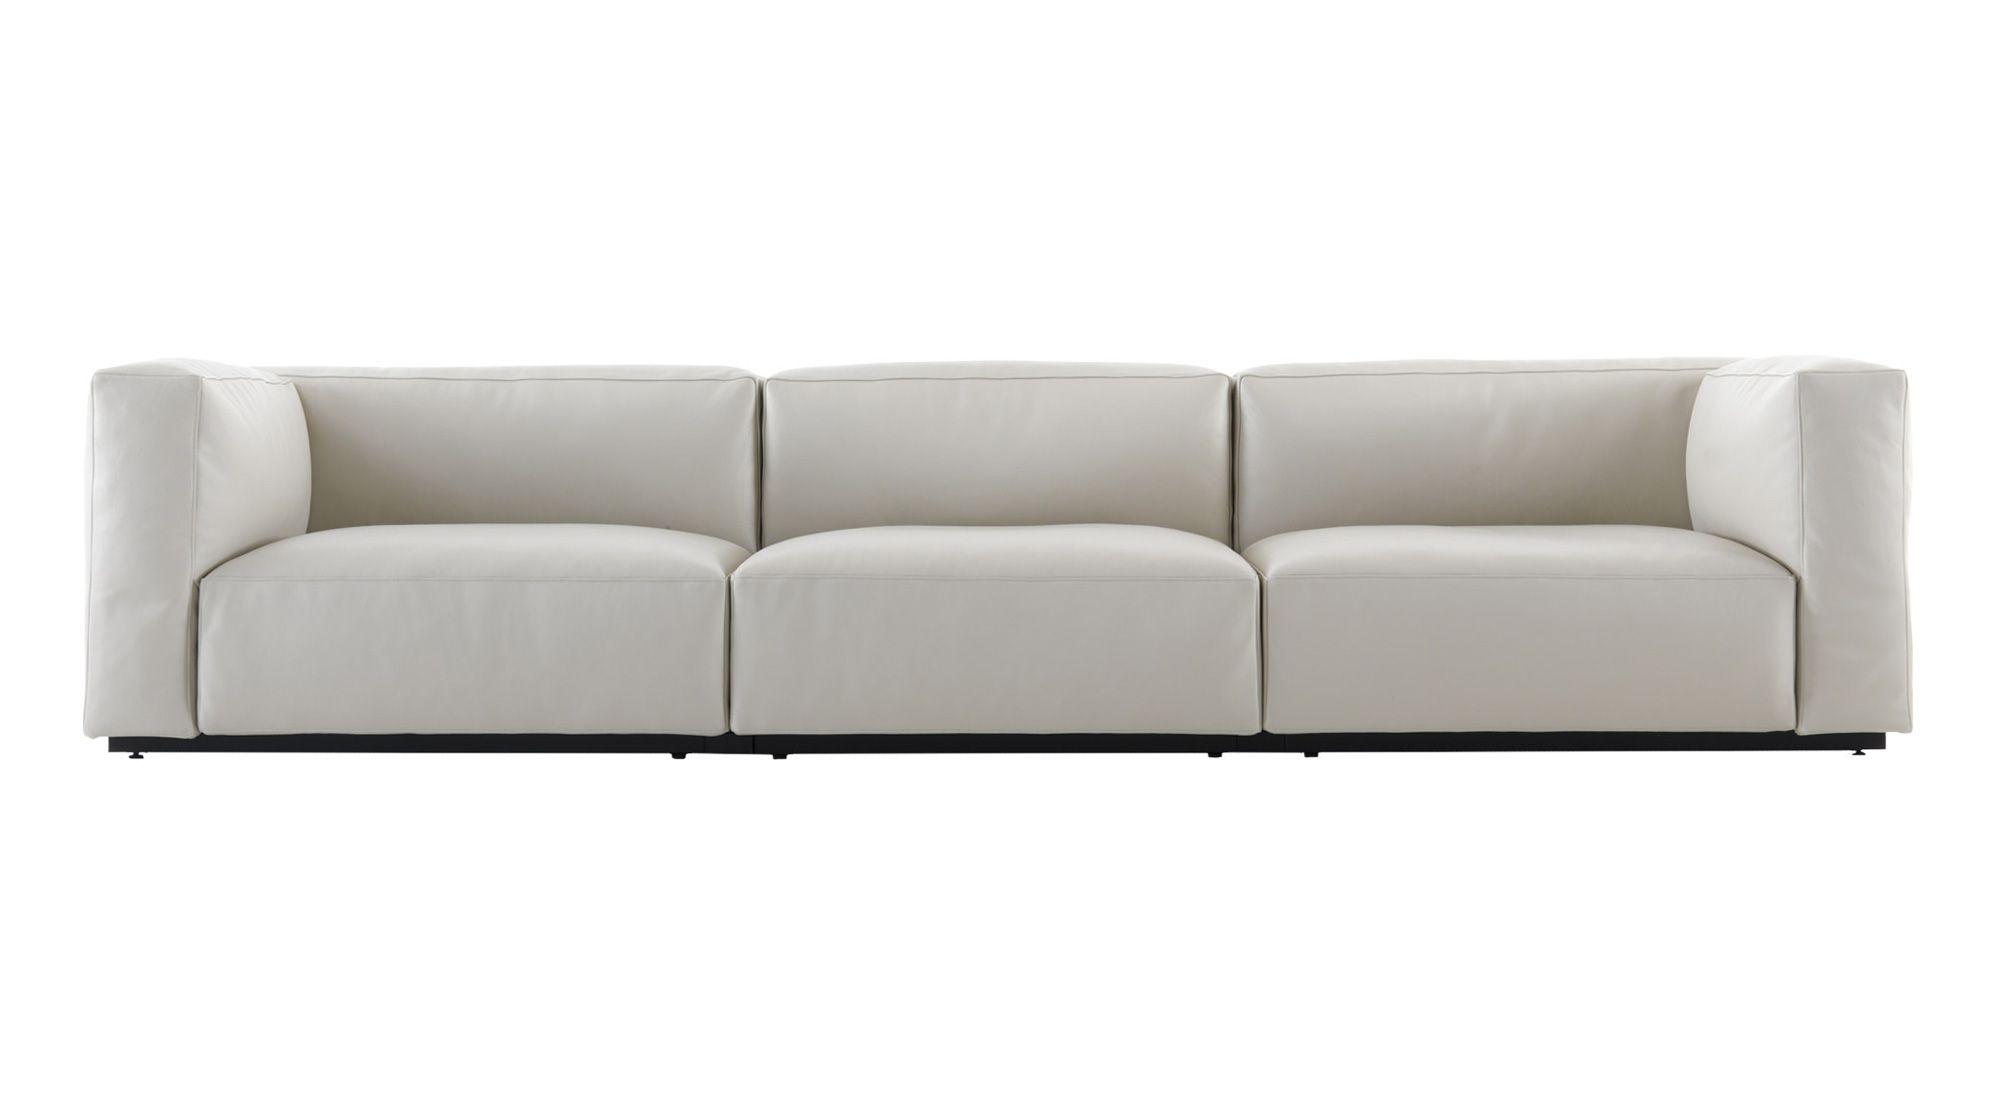 Cassina 271 Mex Cube Design Piero Lissoni Sofa Design Sofa